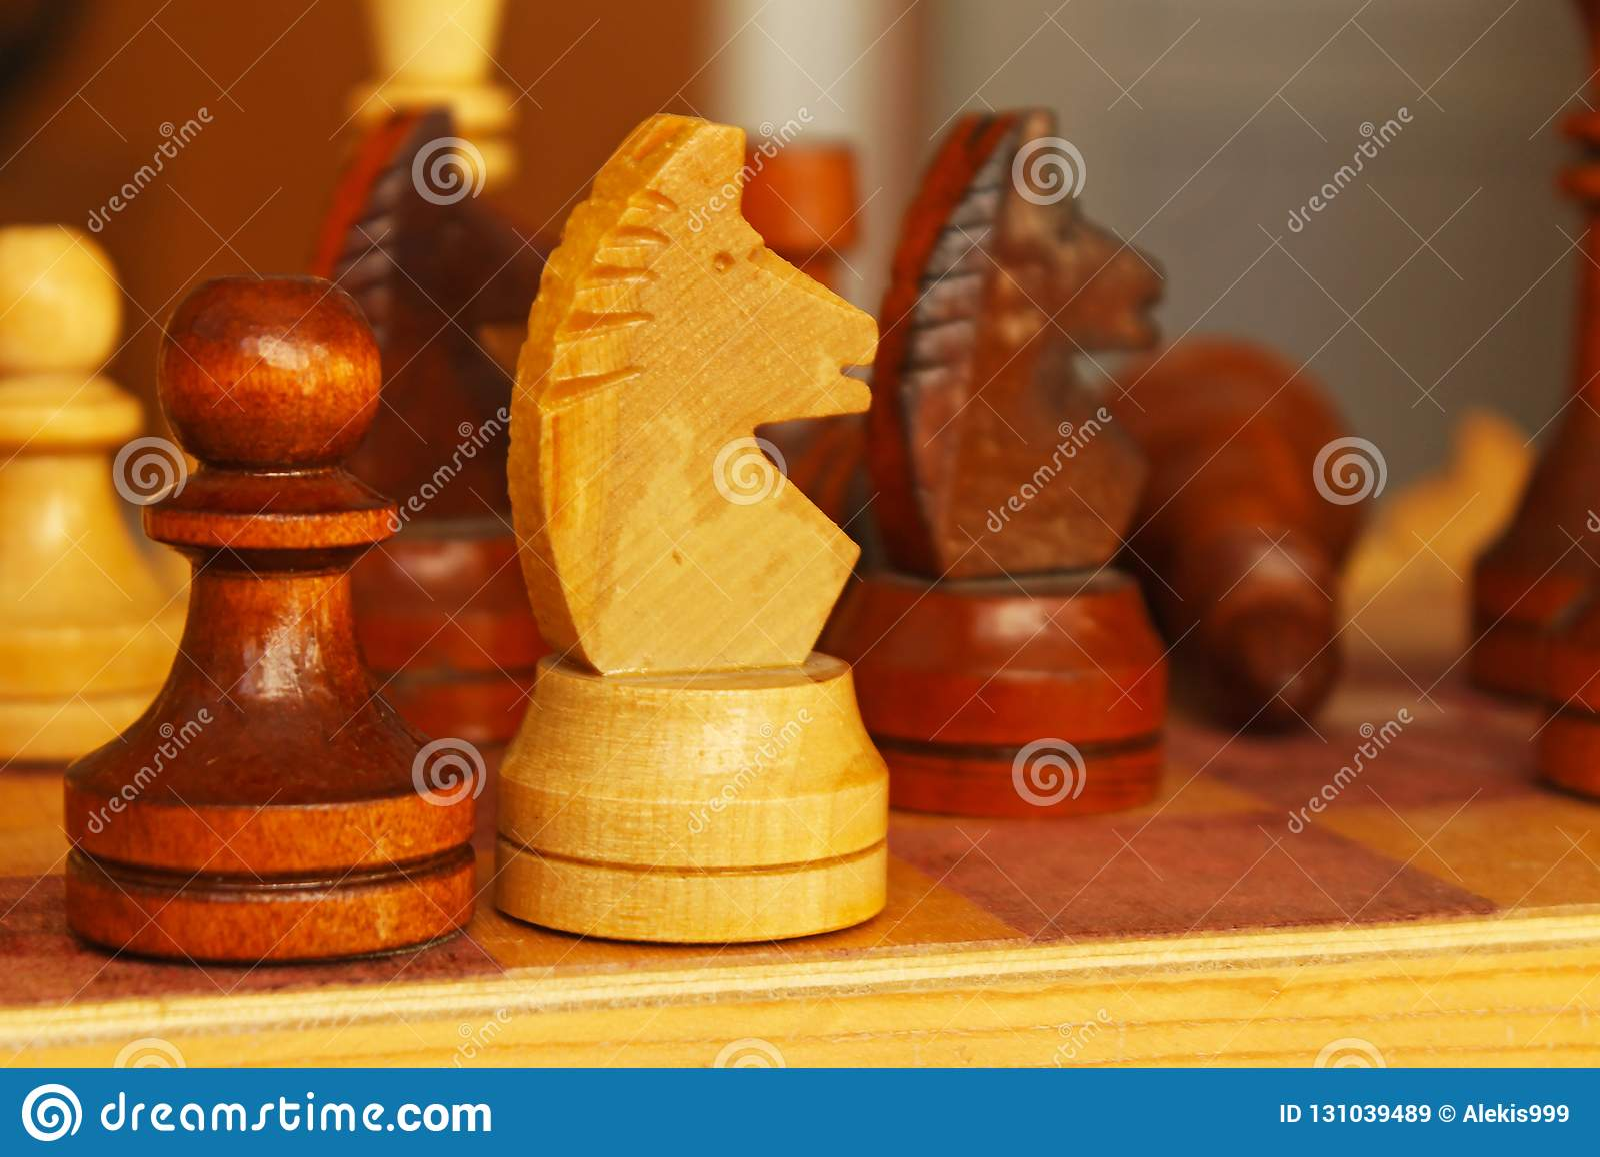 Partes de xadrez na tabela